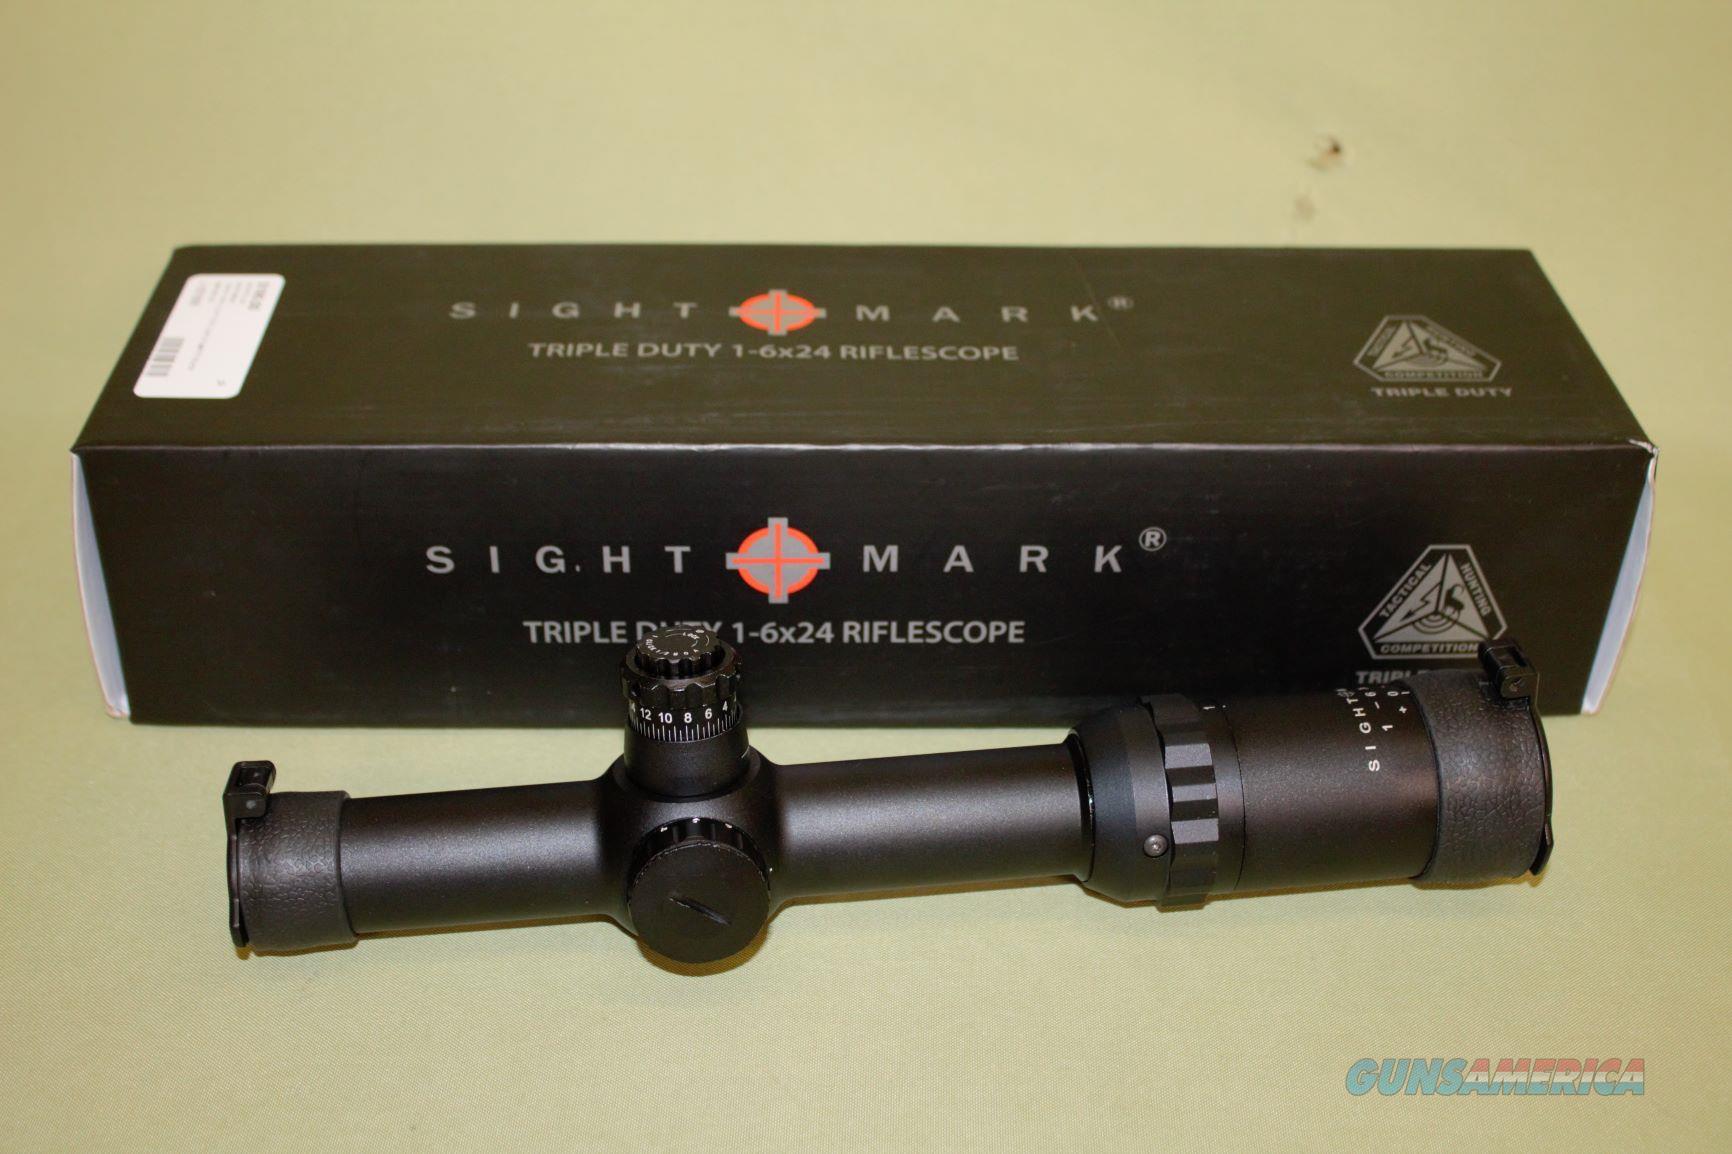 Sightmark 1-6x24 Triple Duty NIB  Non-Guns > Scopes/Mounts/Rings & Optics > Tactical Scopes > Variable Recticle